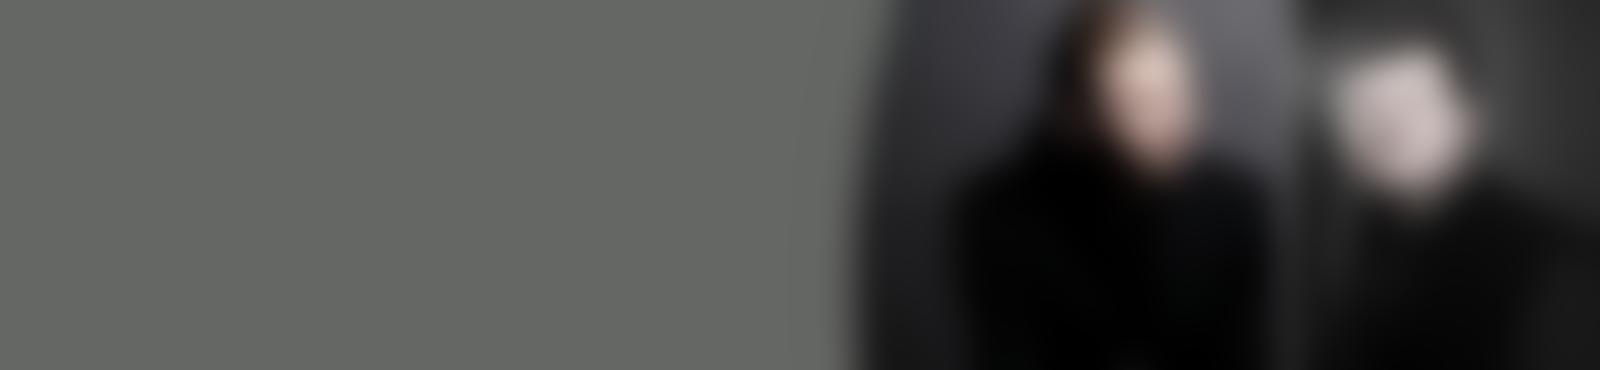 Blurred 5141ef24 21d4 4049 acdb fc0703ebd896